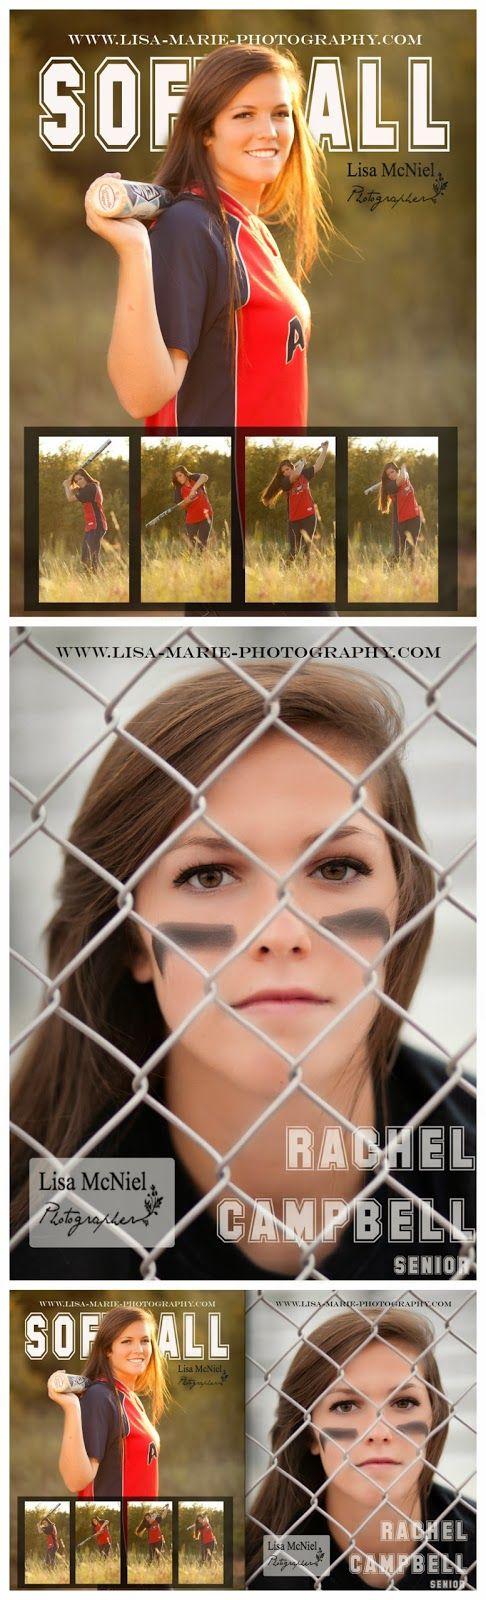 Softball senior picture ideas, #Portraits #Seniorpictures #Softball www.Lisa-Marie-Photography.com